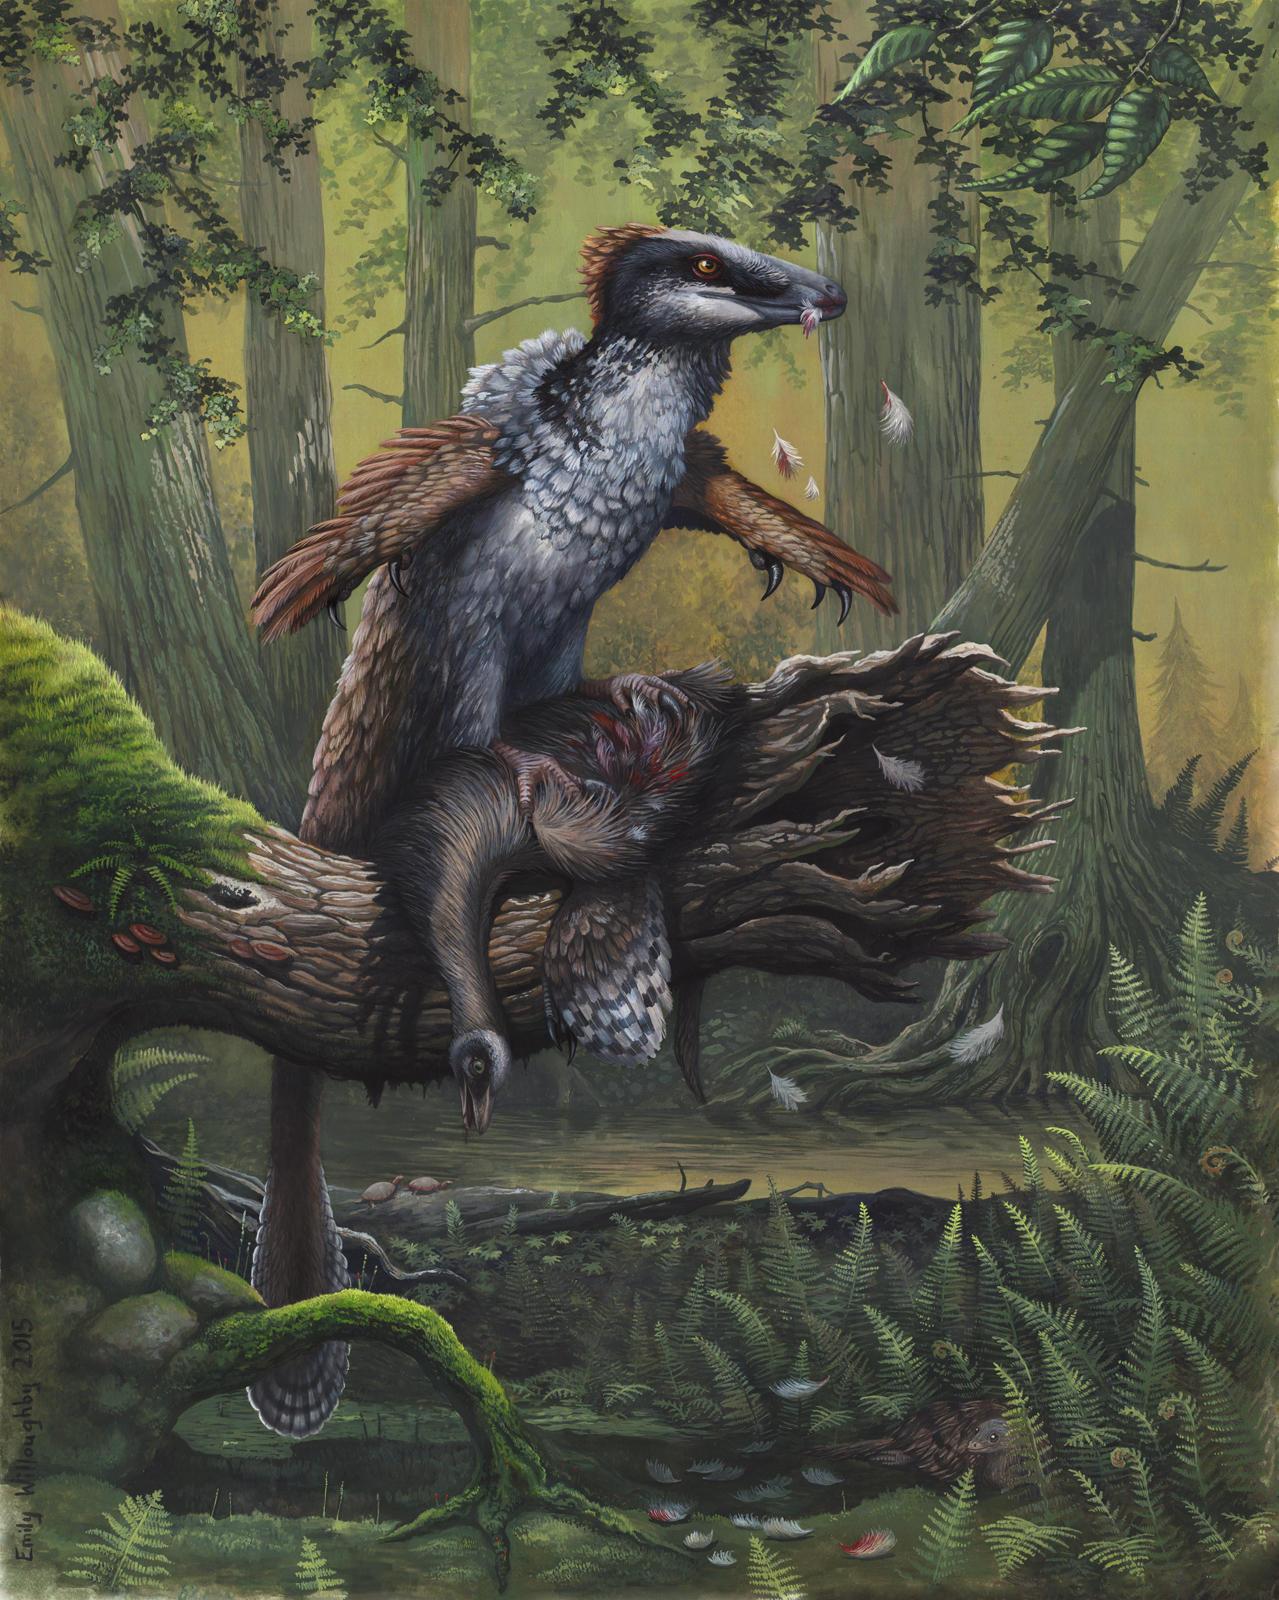 Dakotaraptor's Ornithomimus Dinner by EWilloughby